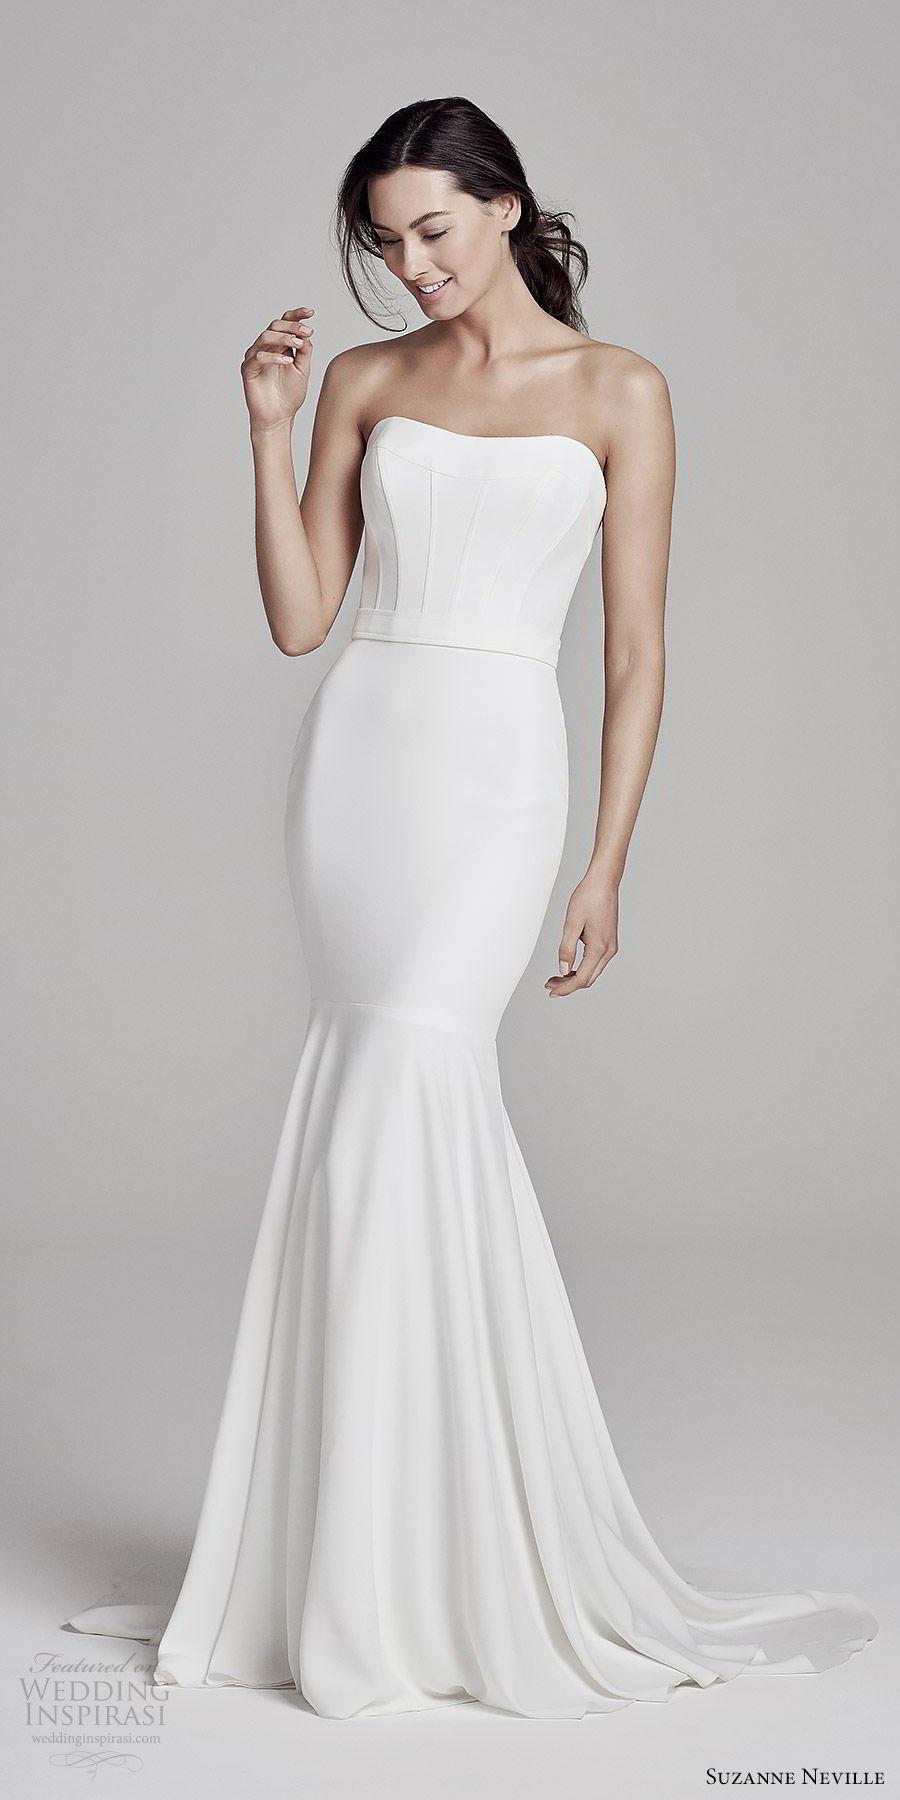 suzanne neville bridal 2019 strapless semi sweetheart minimally embellished mermaid wedding dress (selene) sweep train clean modern mv